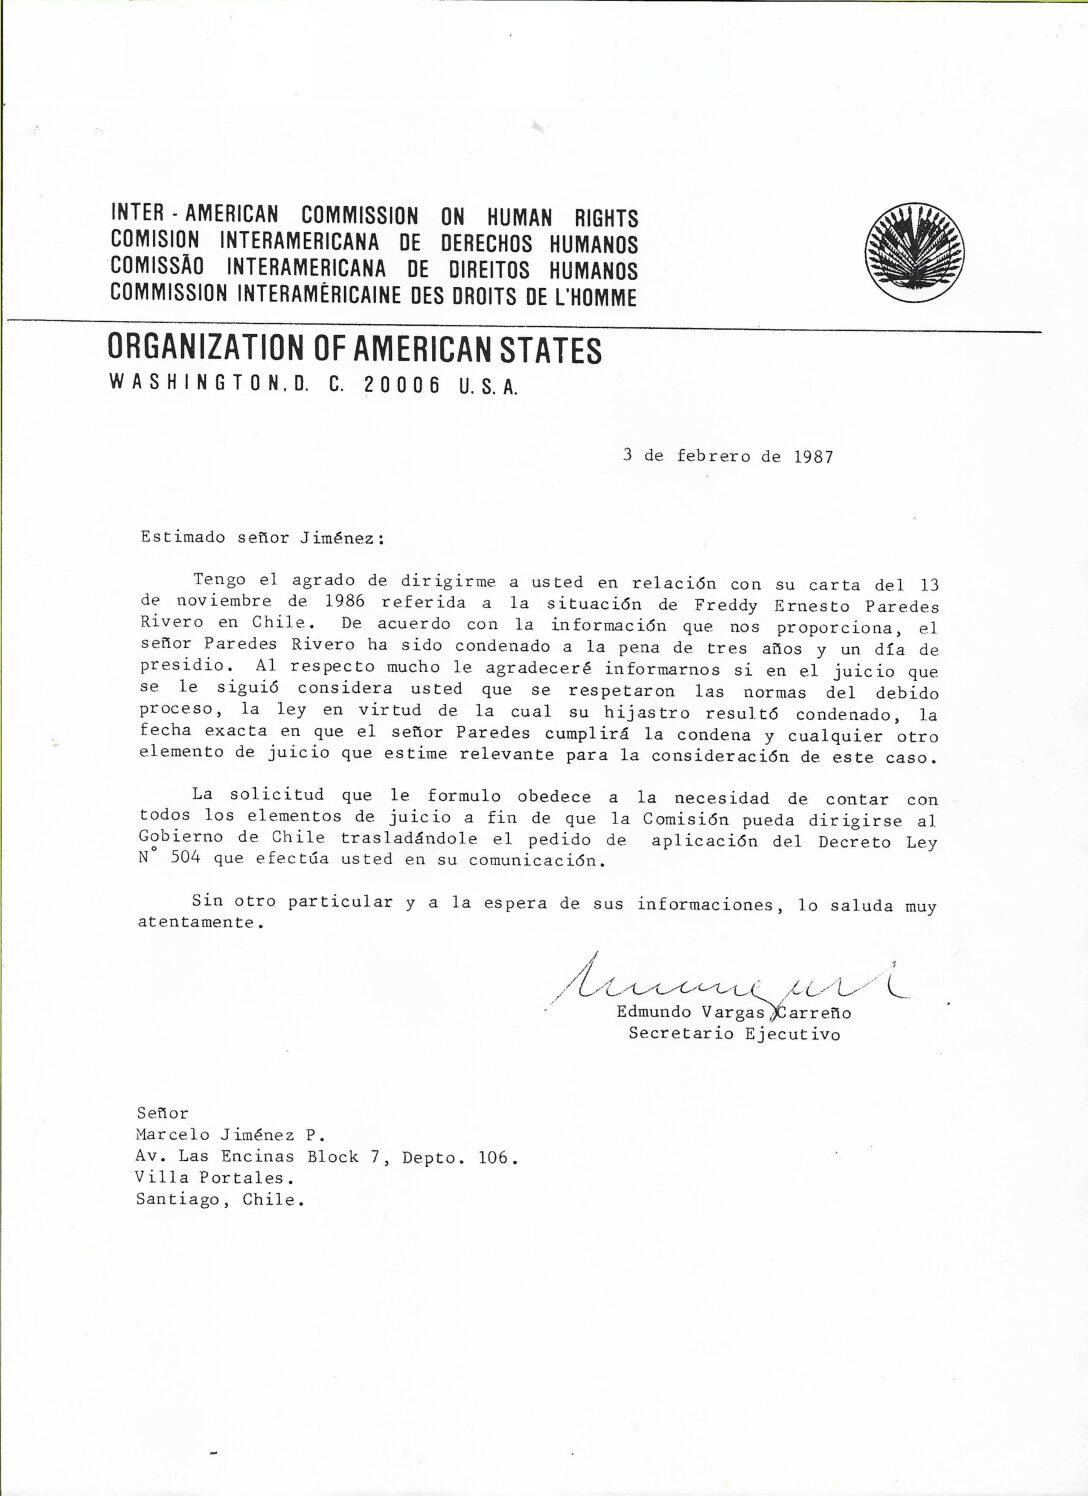 Carta a Marcelo Jímenez extendida por la Comisión Interamericana de Derechos Humanos